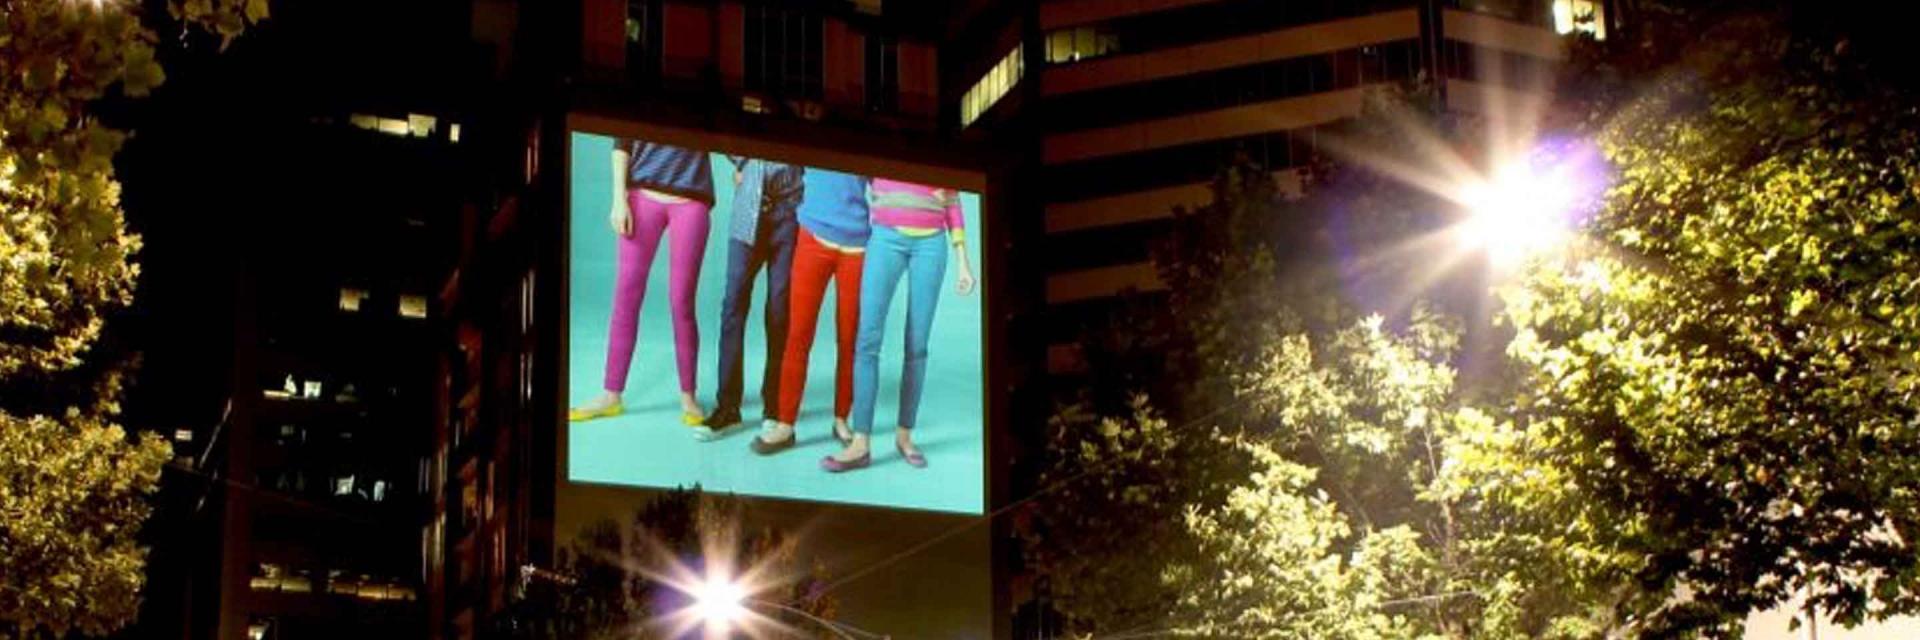 Guerilla marketing vidéo projection